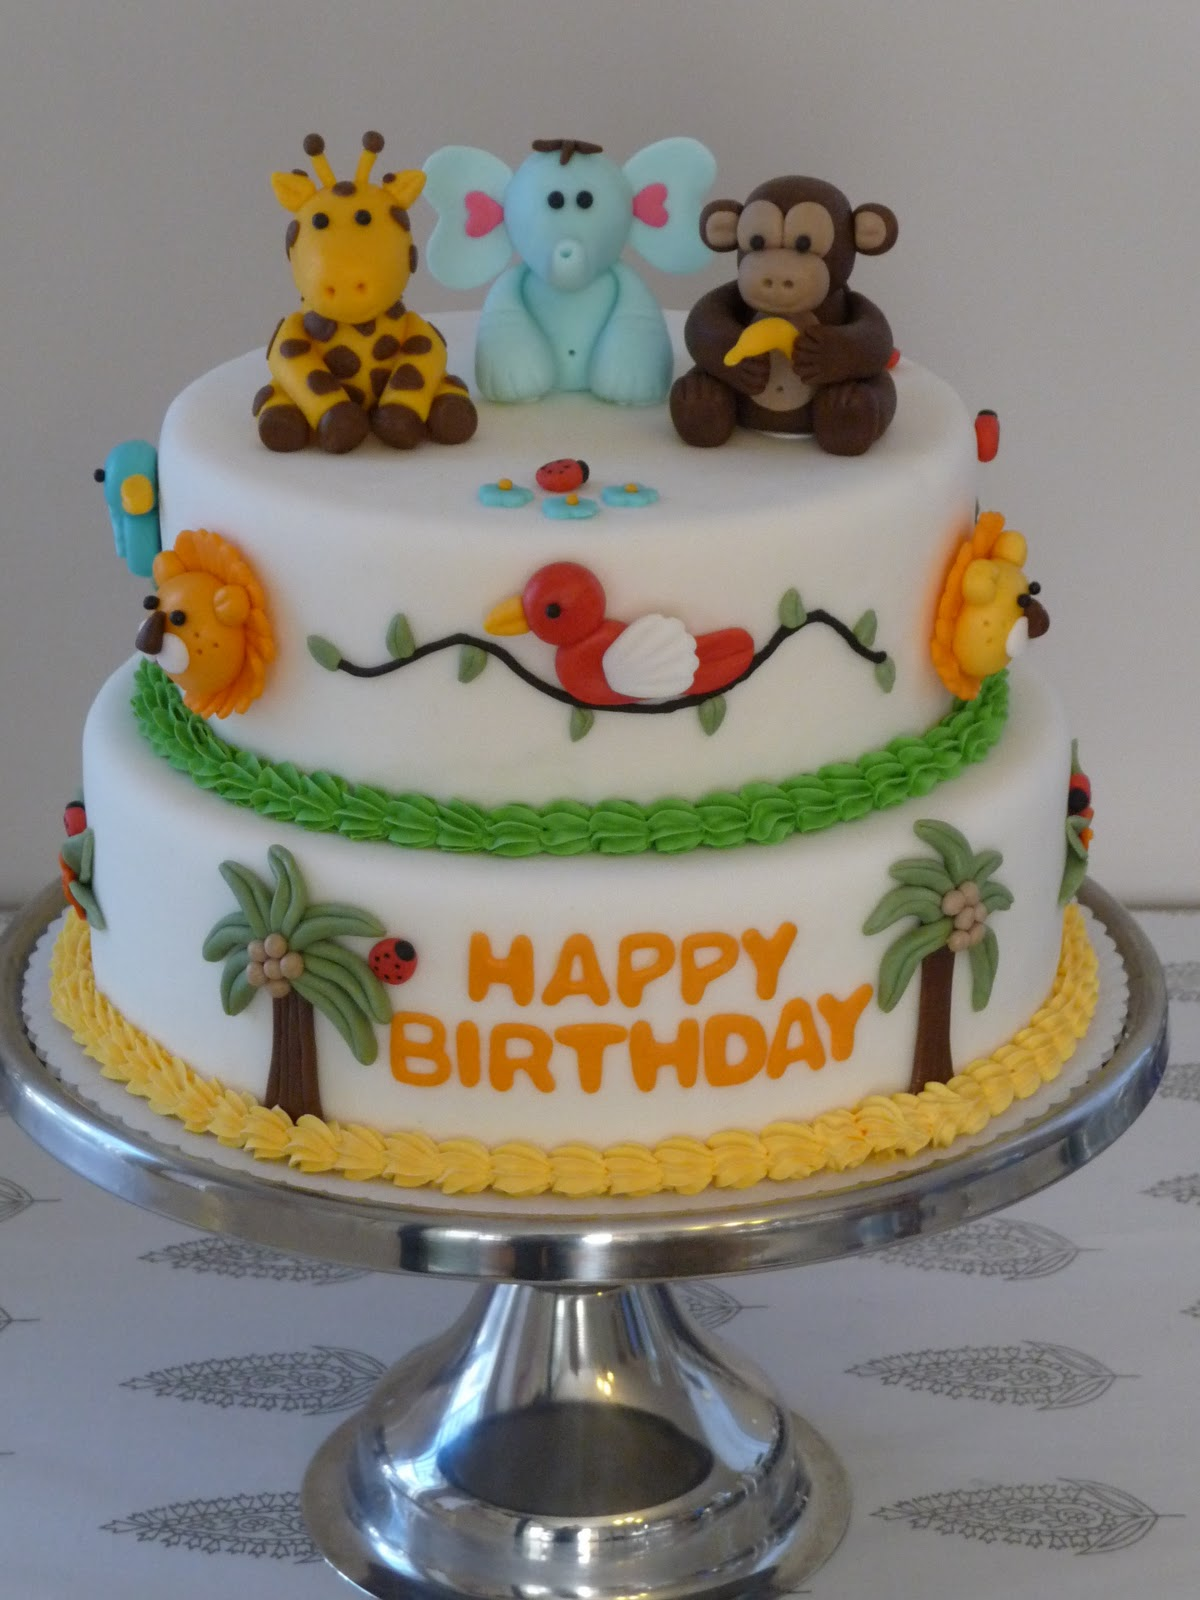 CLASSIC CAKES: 2 tier Fondant